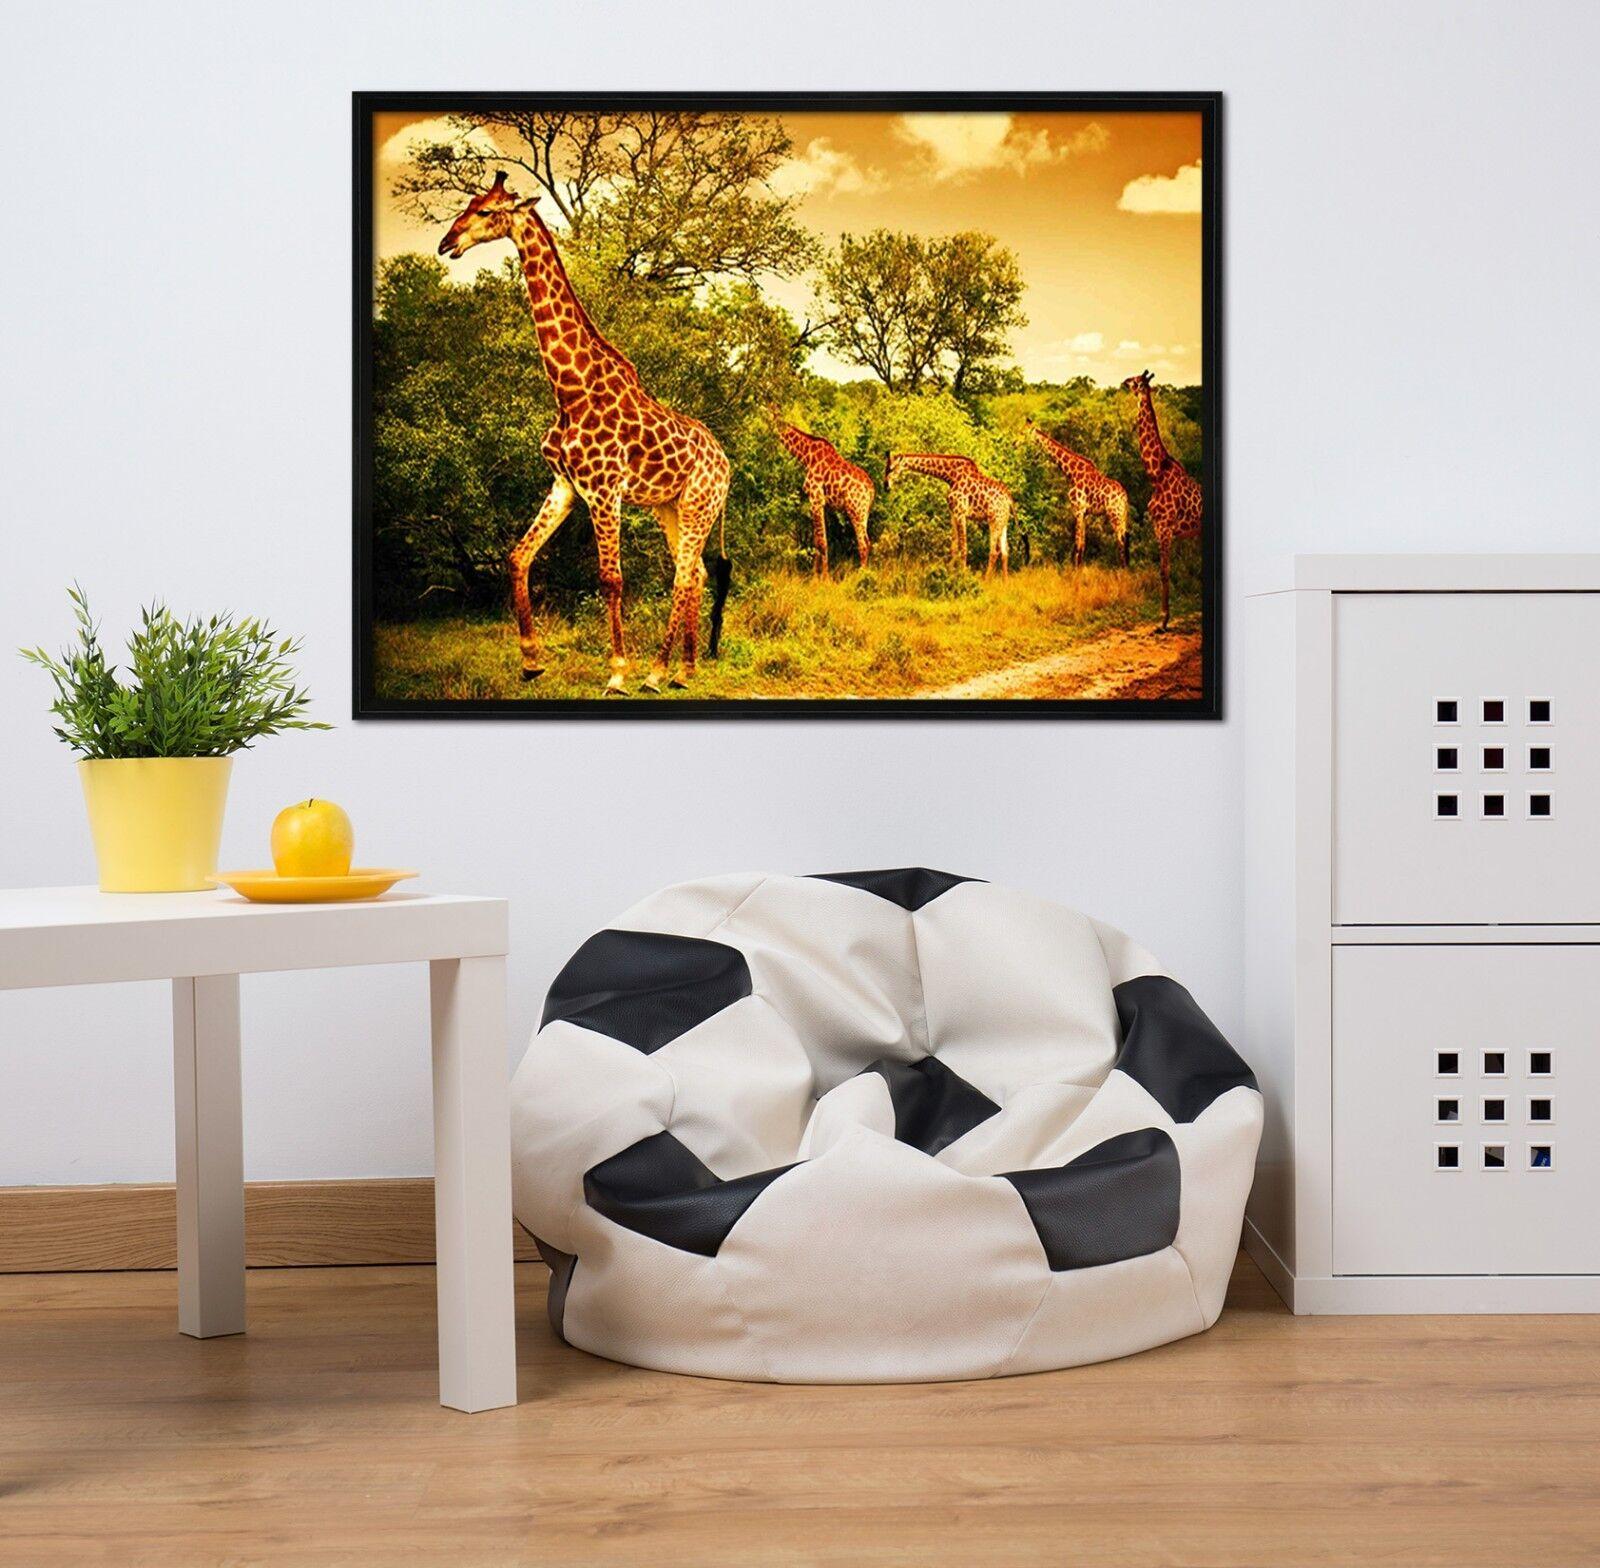 3D Giraffe Group Forest 2 Framed Poster Home Decor Print Painting Art WALLPAPER